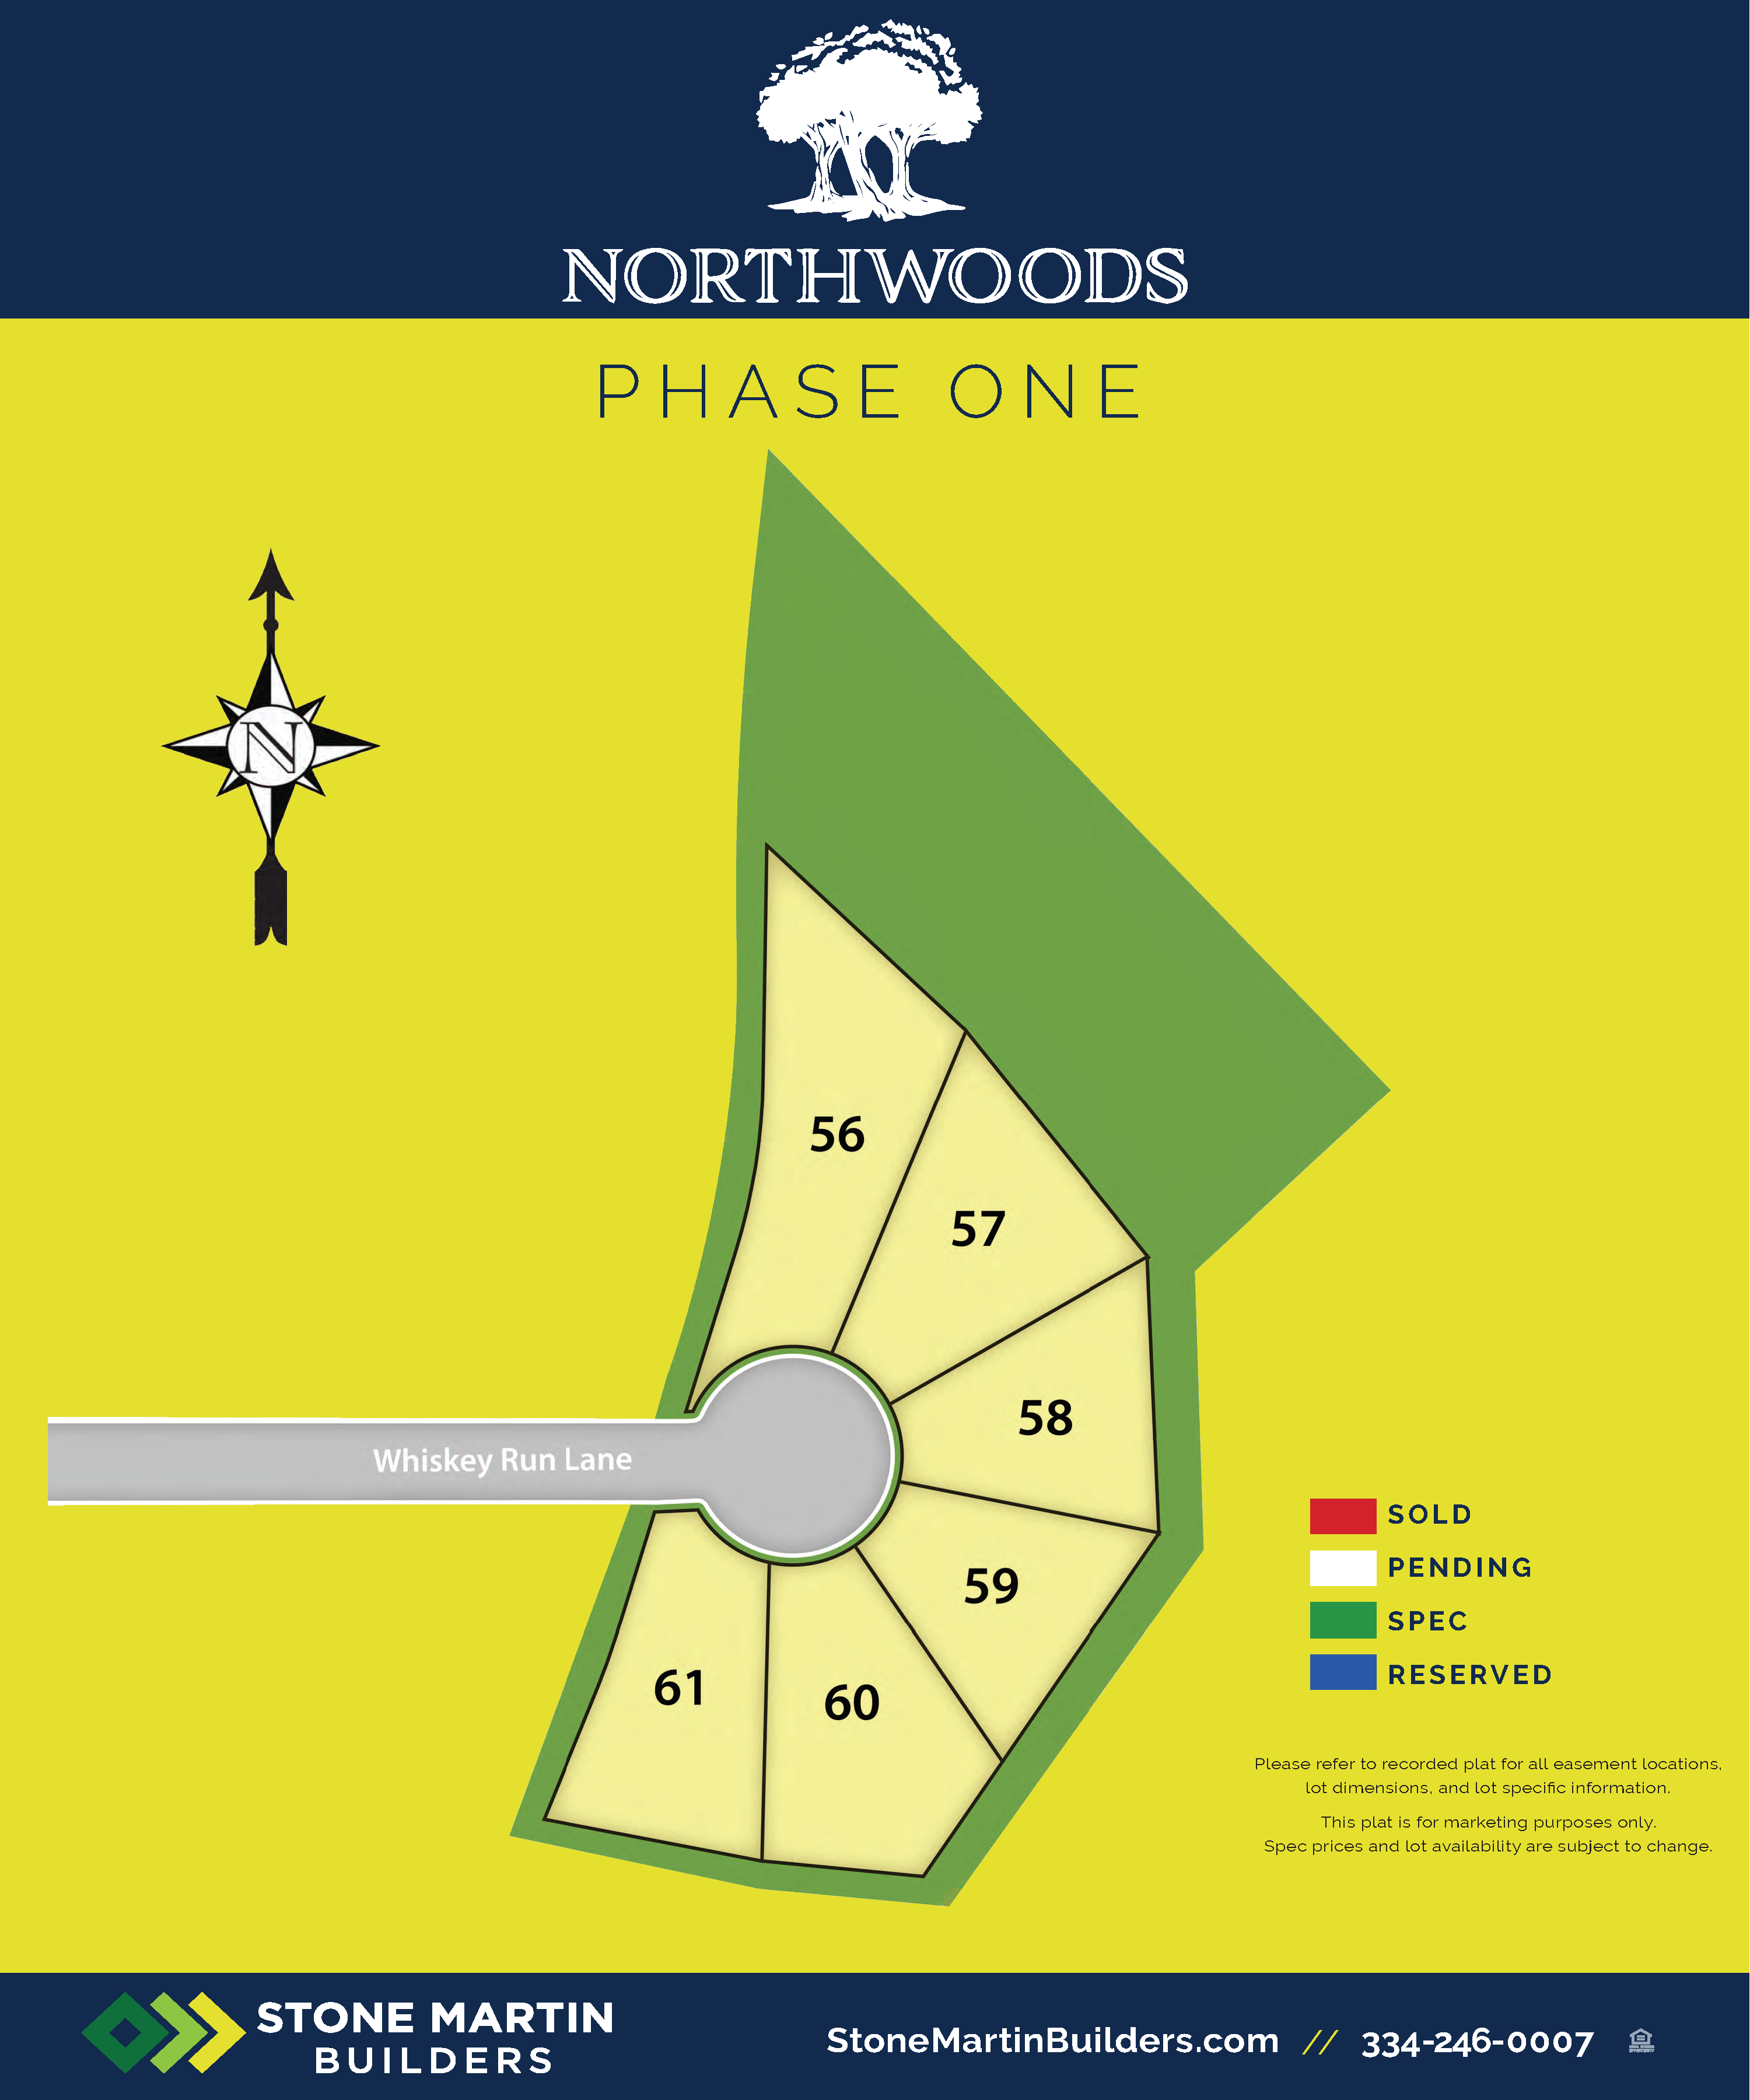 Auburn, AL Northwoods New Homes from Stone Martin Builders